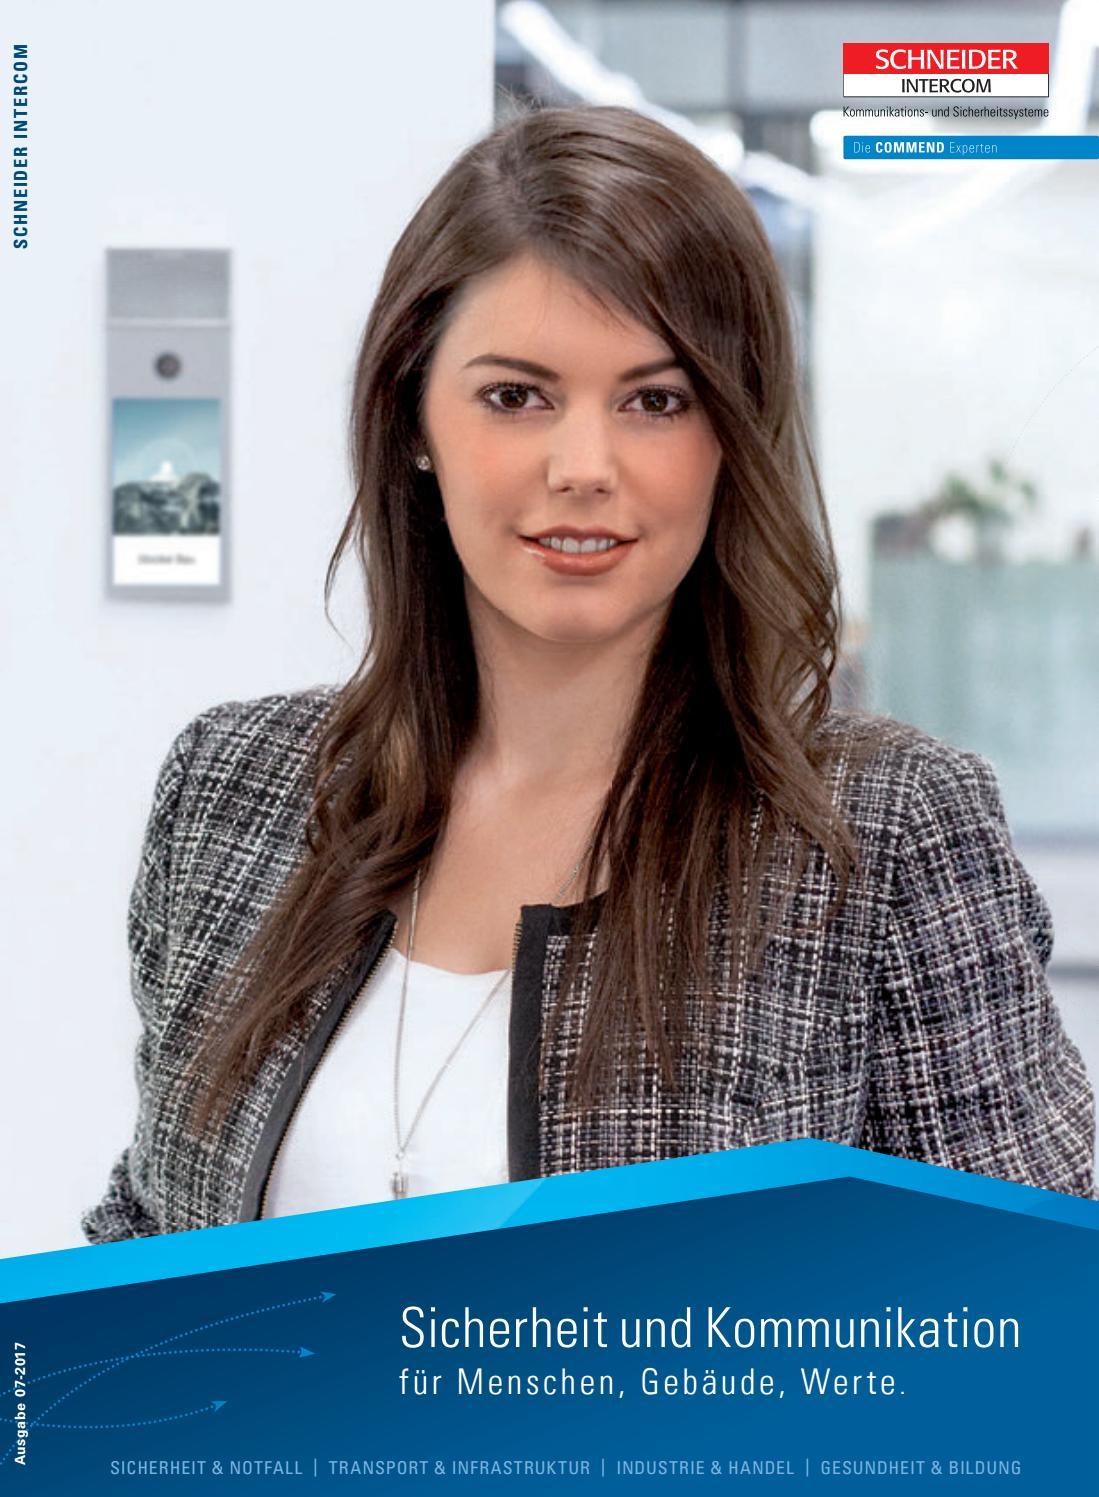 Schneider Intercom Produktkatalog 07-2017 by Commend International ...